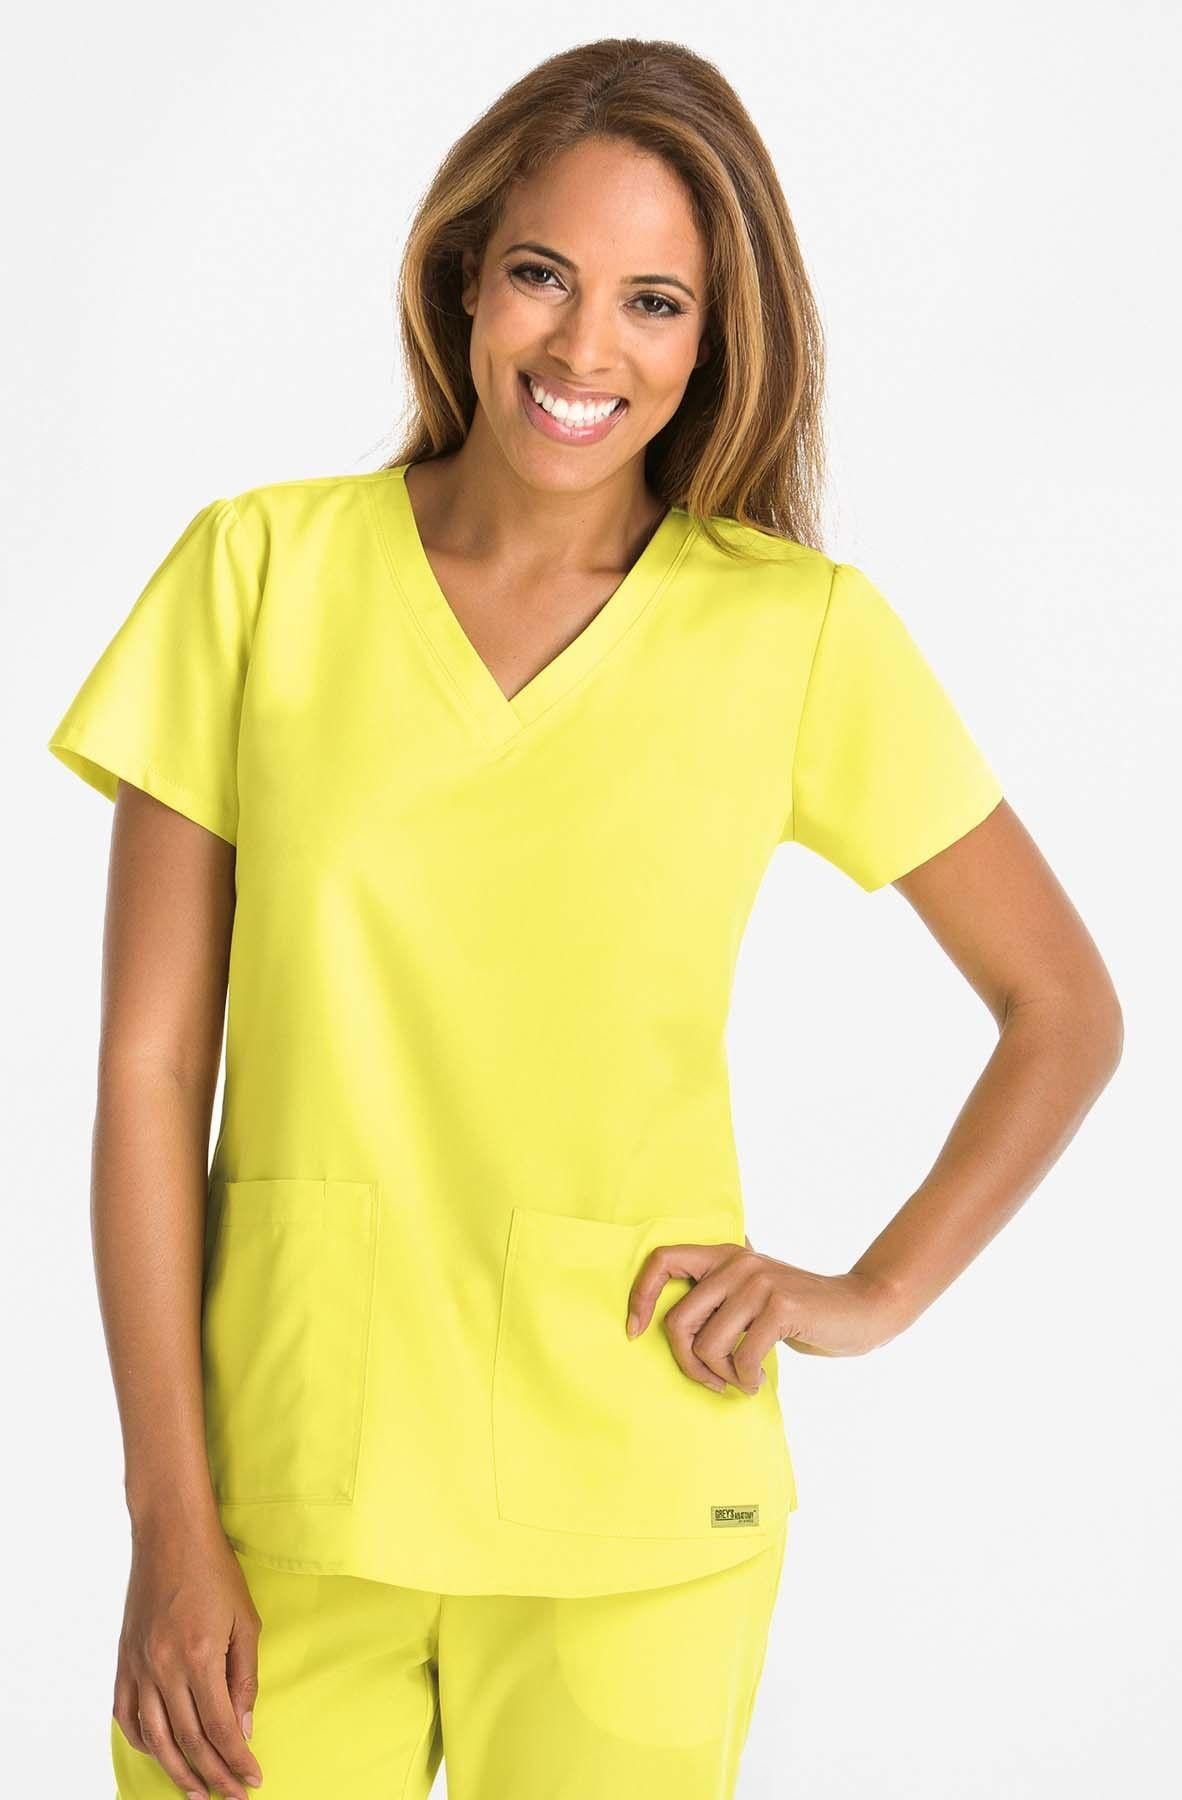 9f9cd61446b 2-Pocket V-Neck Top | Grey's Anatomy by Barco | Scrubs, Greys ...